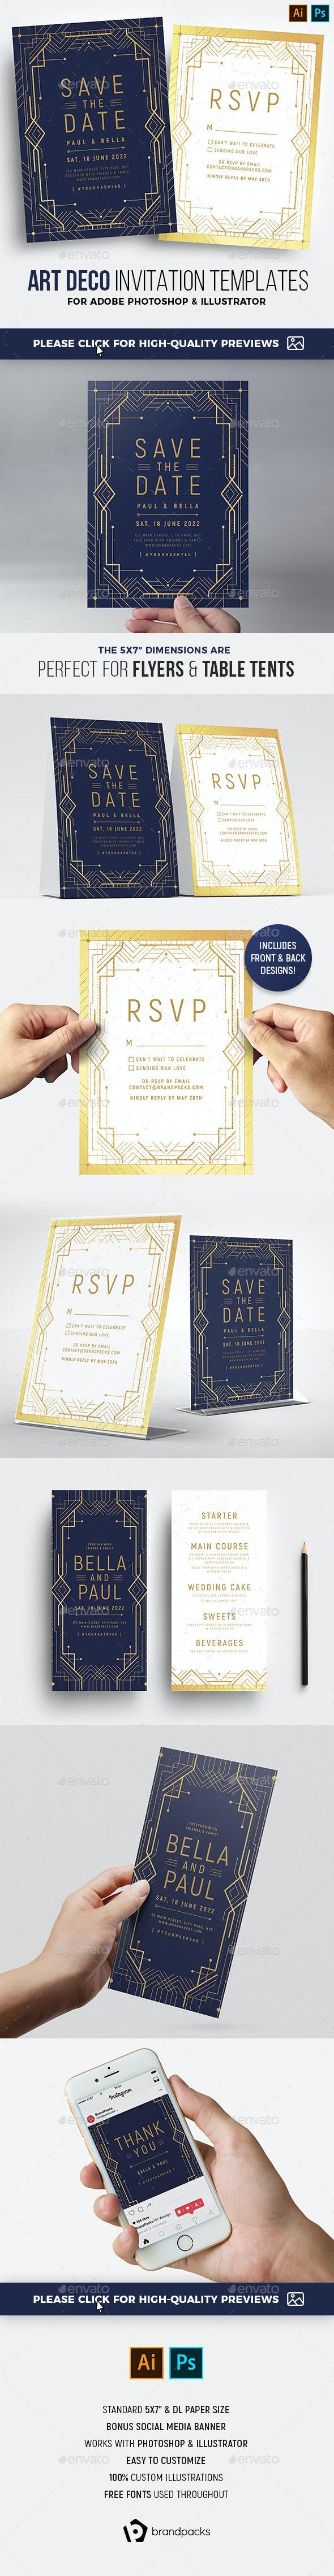 Art Deco Invitation - Weddings Cards & Invites